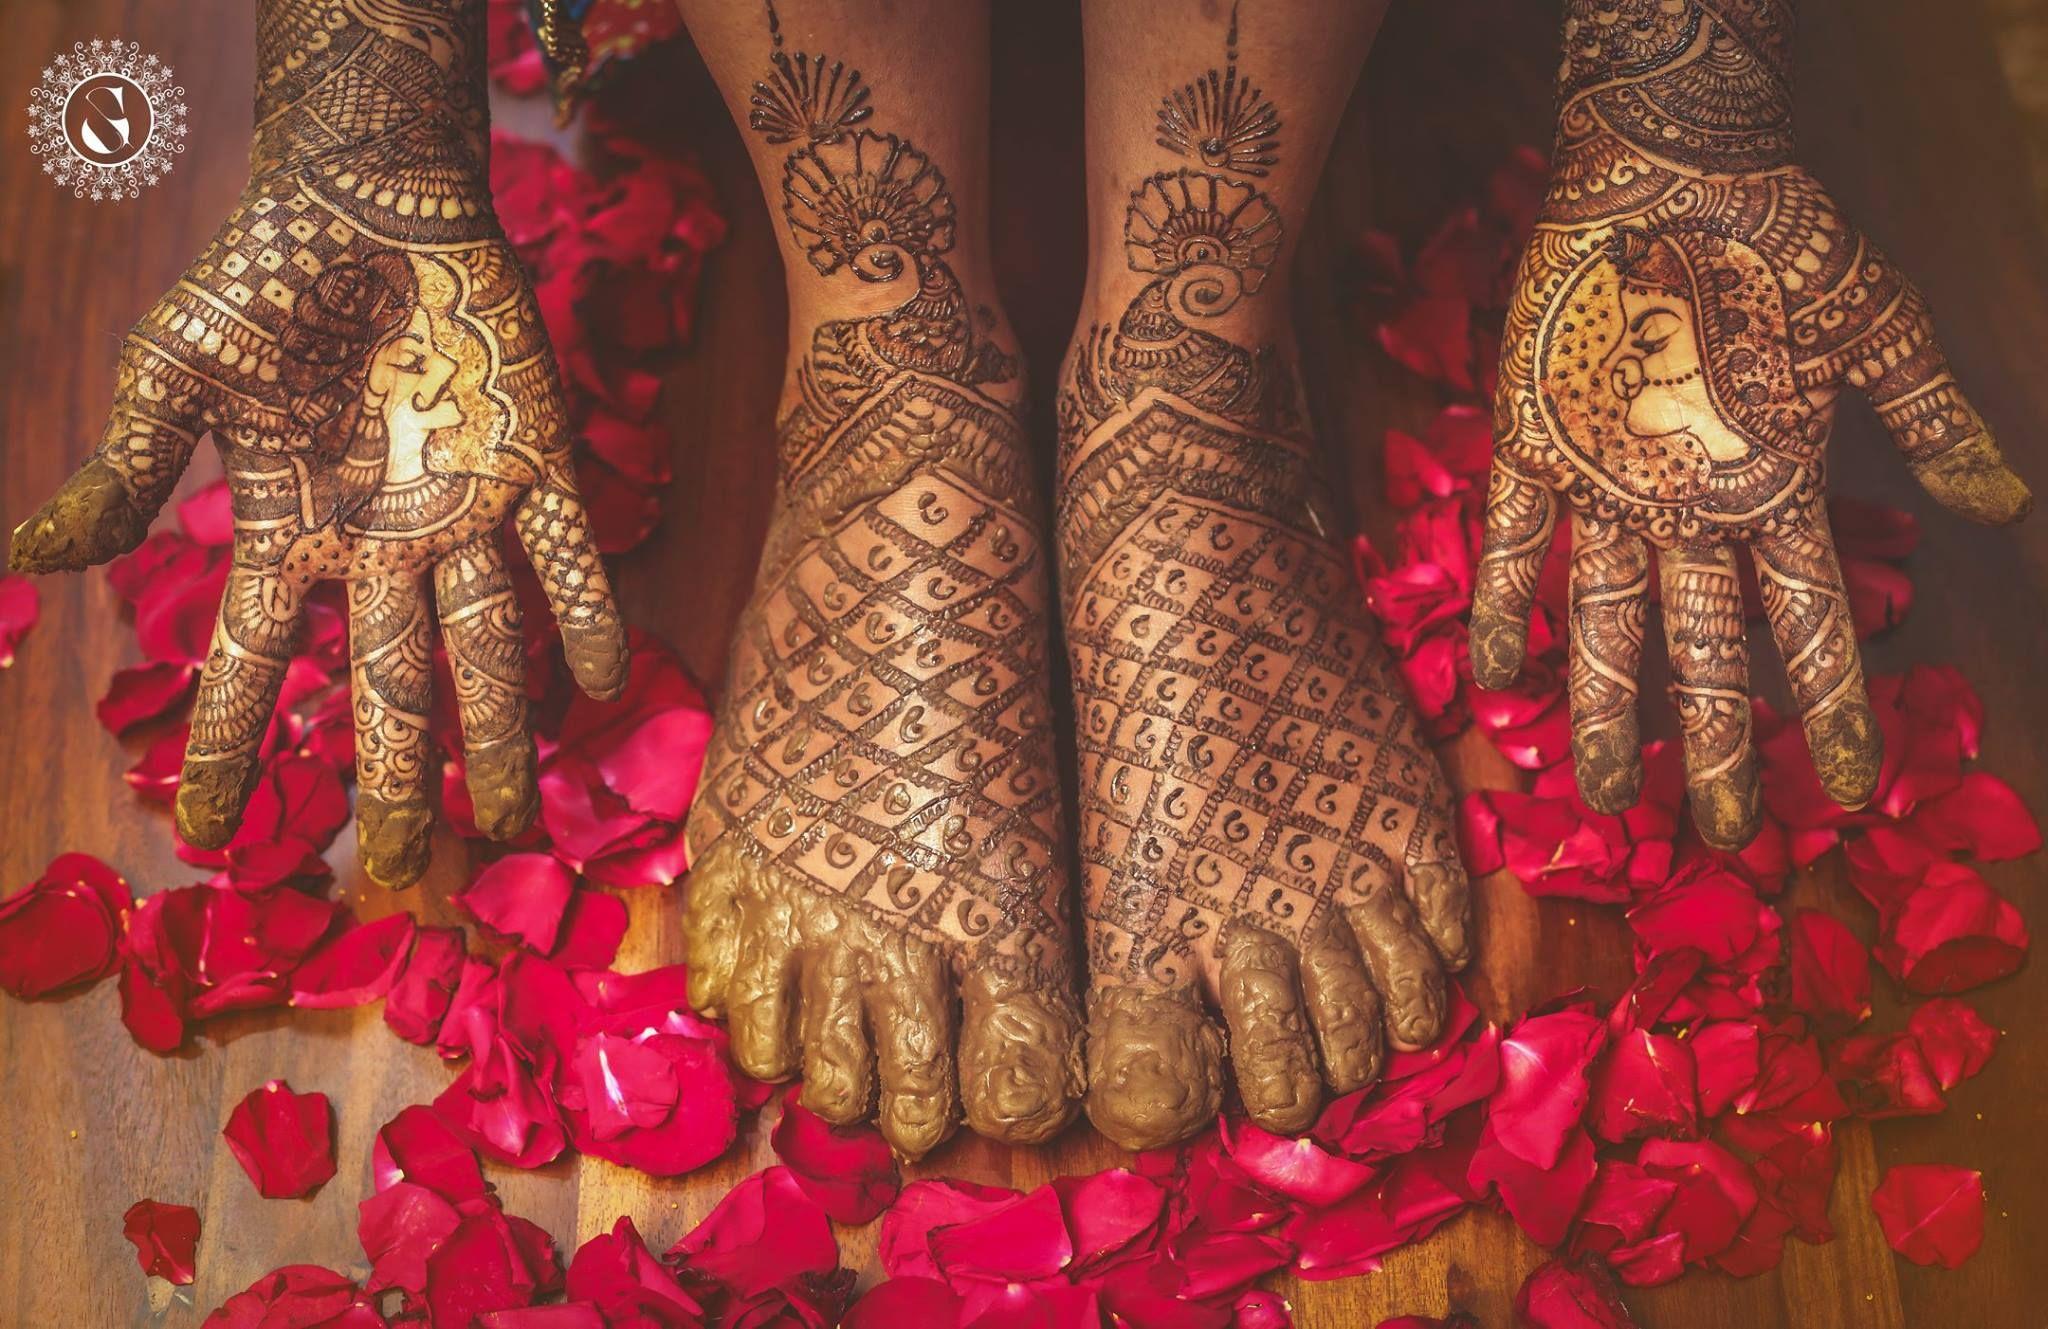 Bridal Mehndi : Bride and groom face bridal mehndi